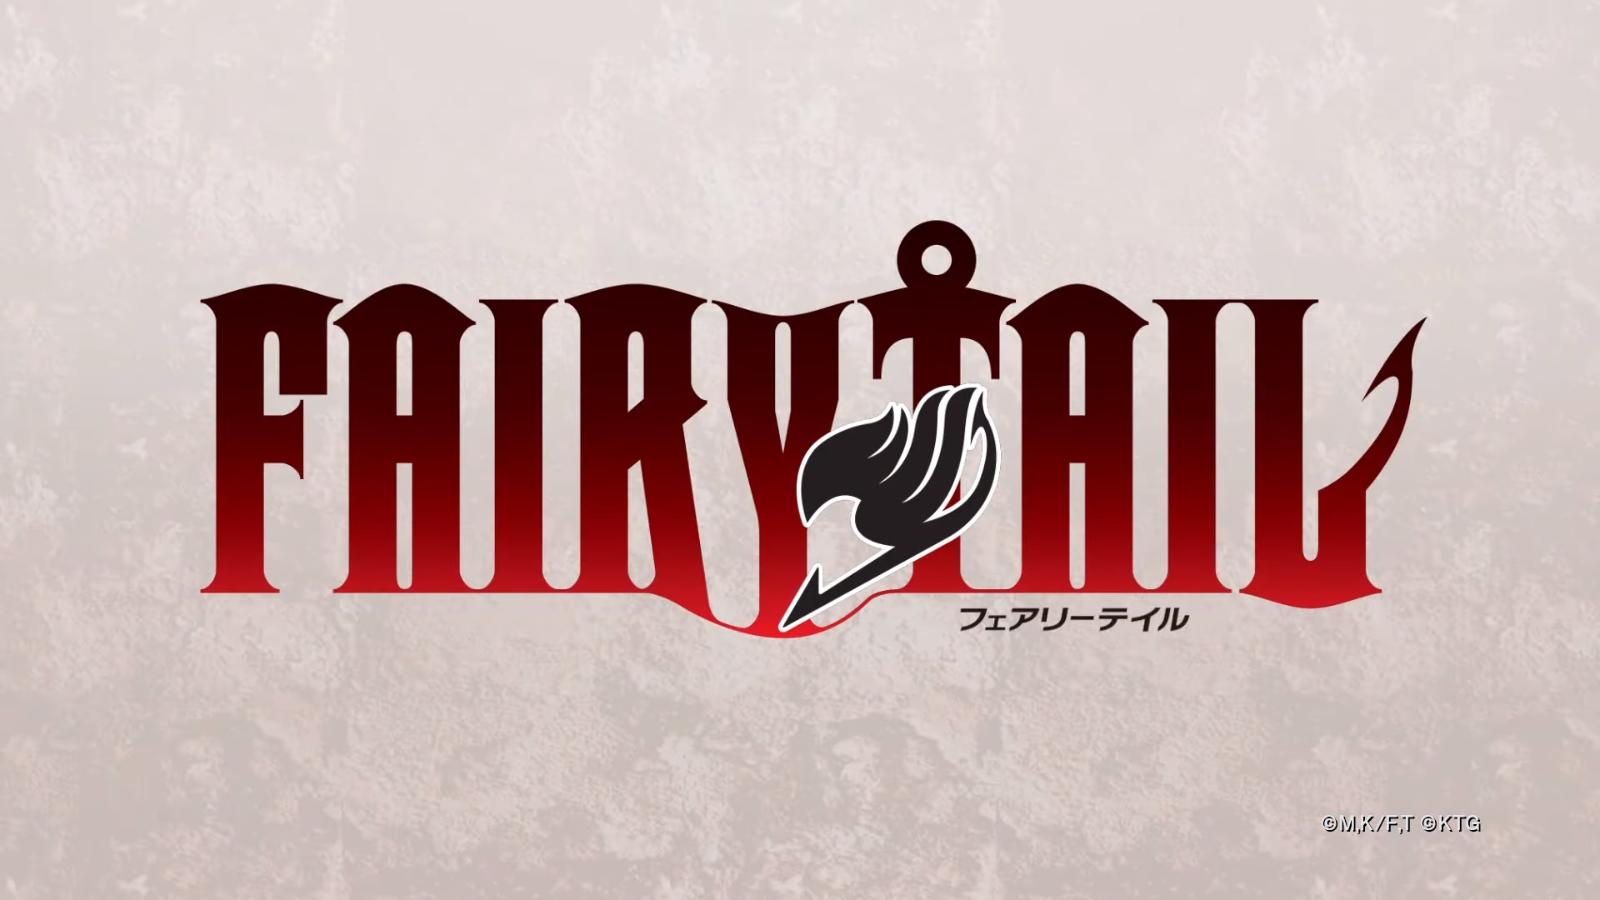 Fairy Tail 692019 2